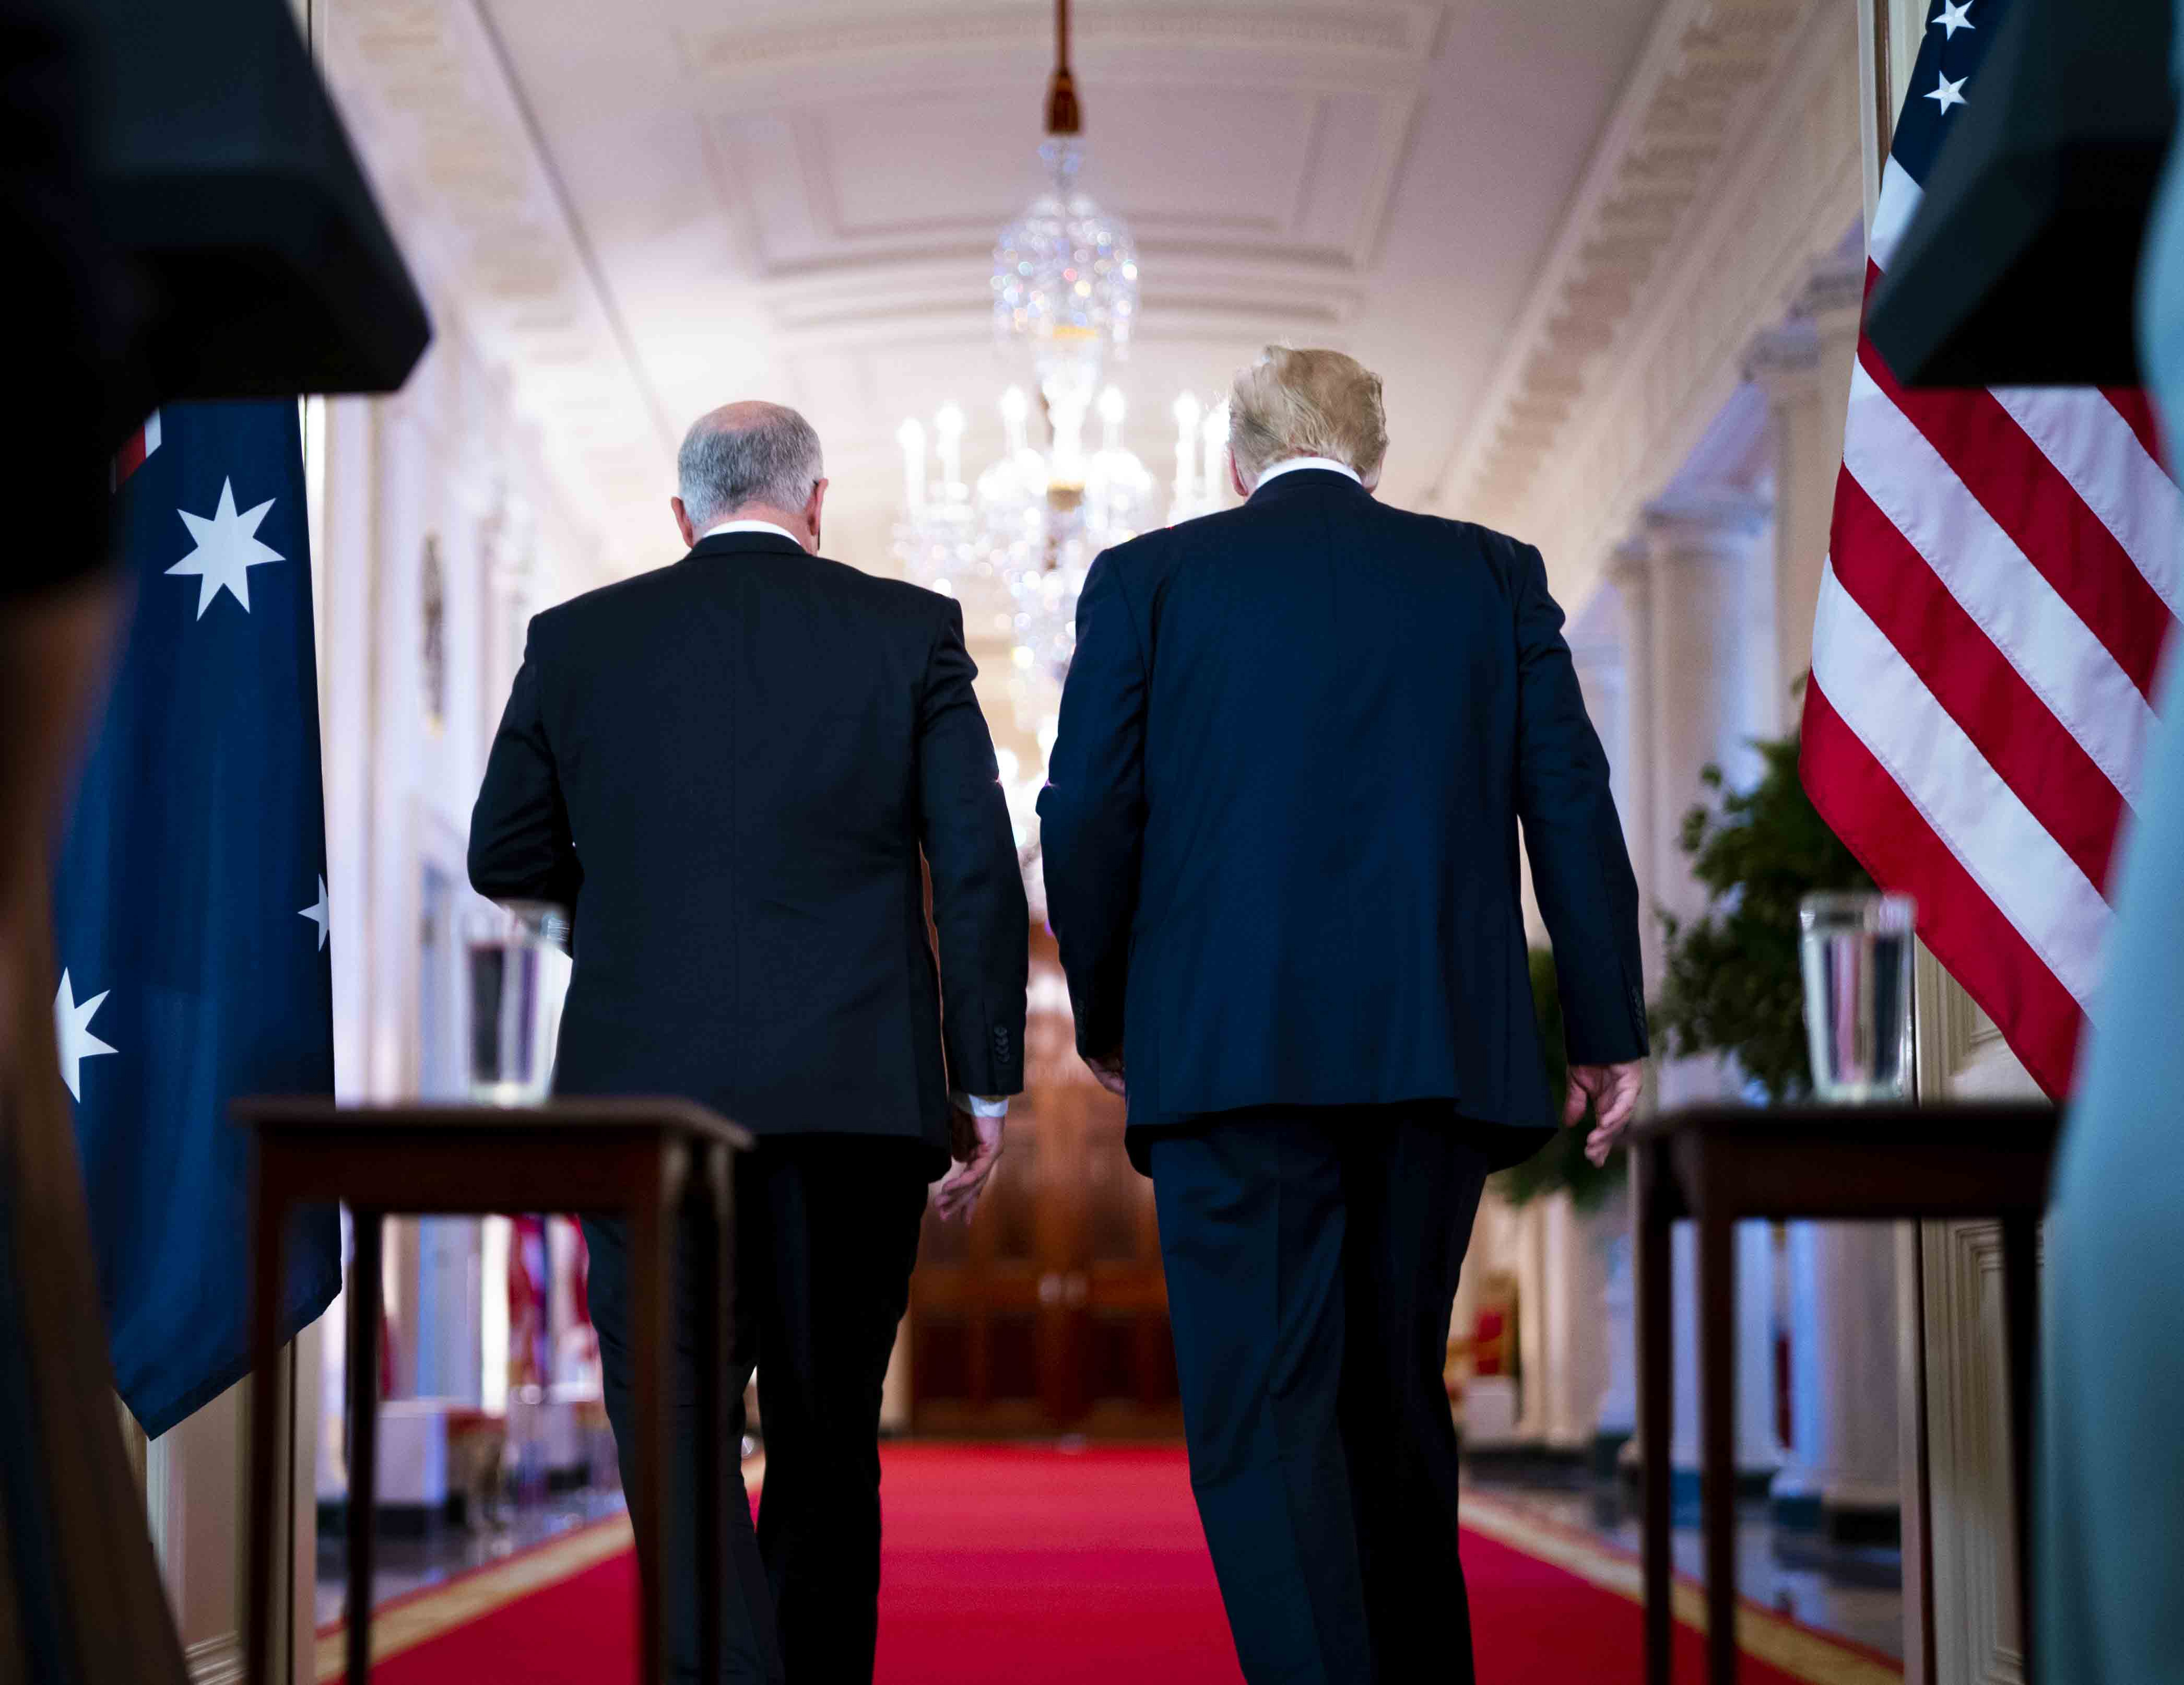 Trump Pressed Ukraine Leader for Corruption Inquiry Into Bidens Son